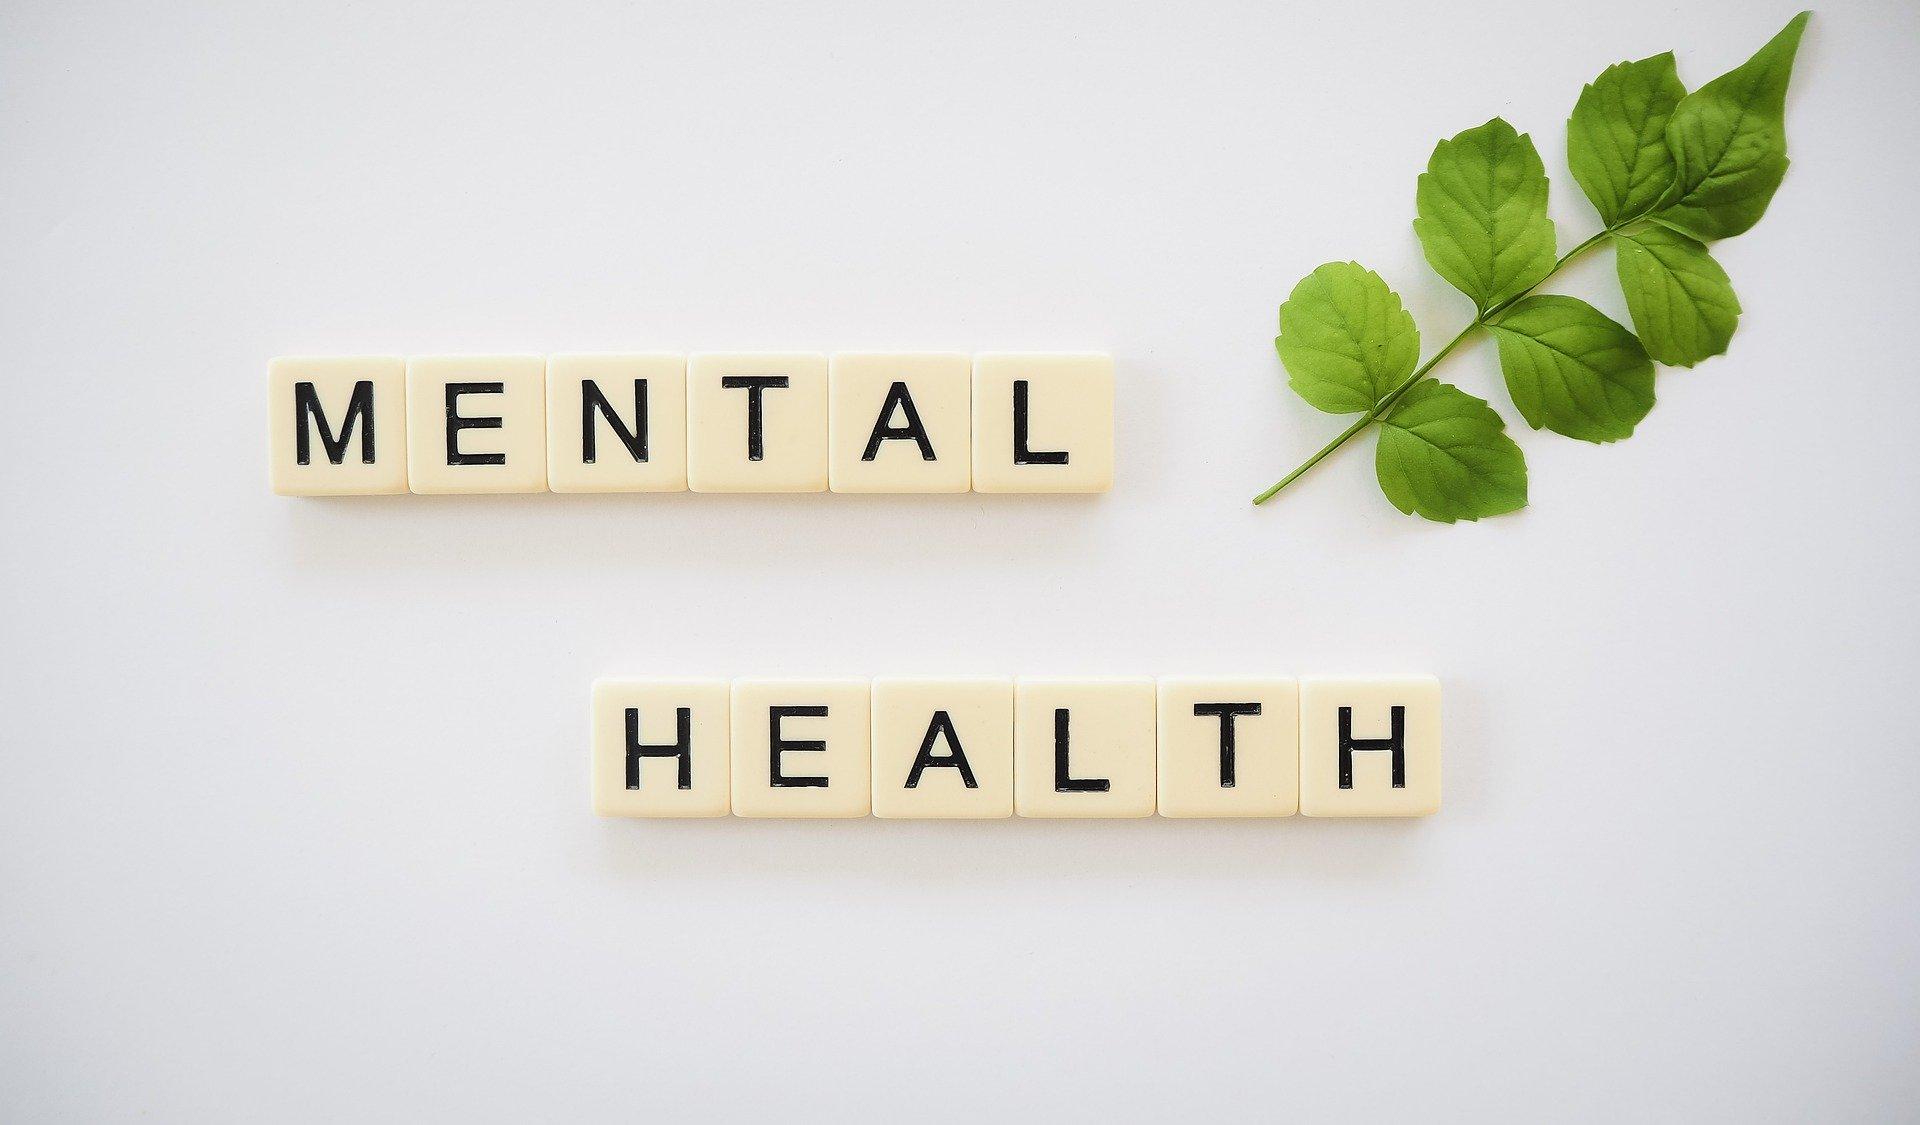 mental-health-4232031_1920